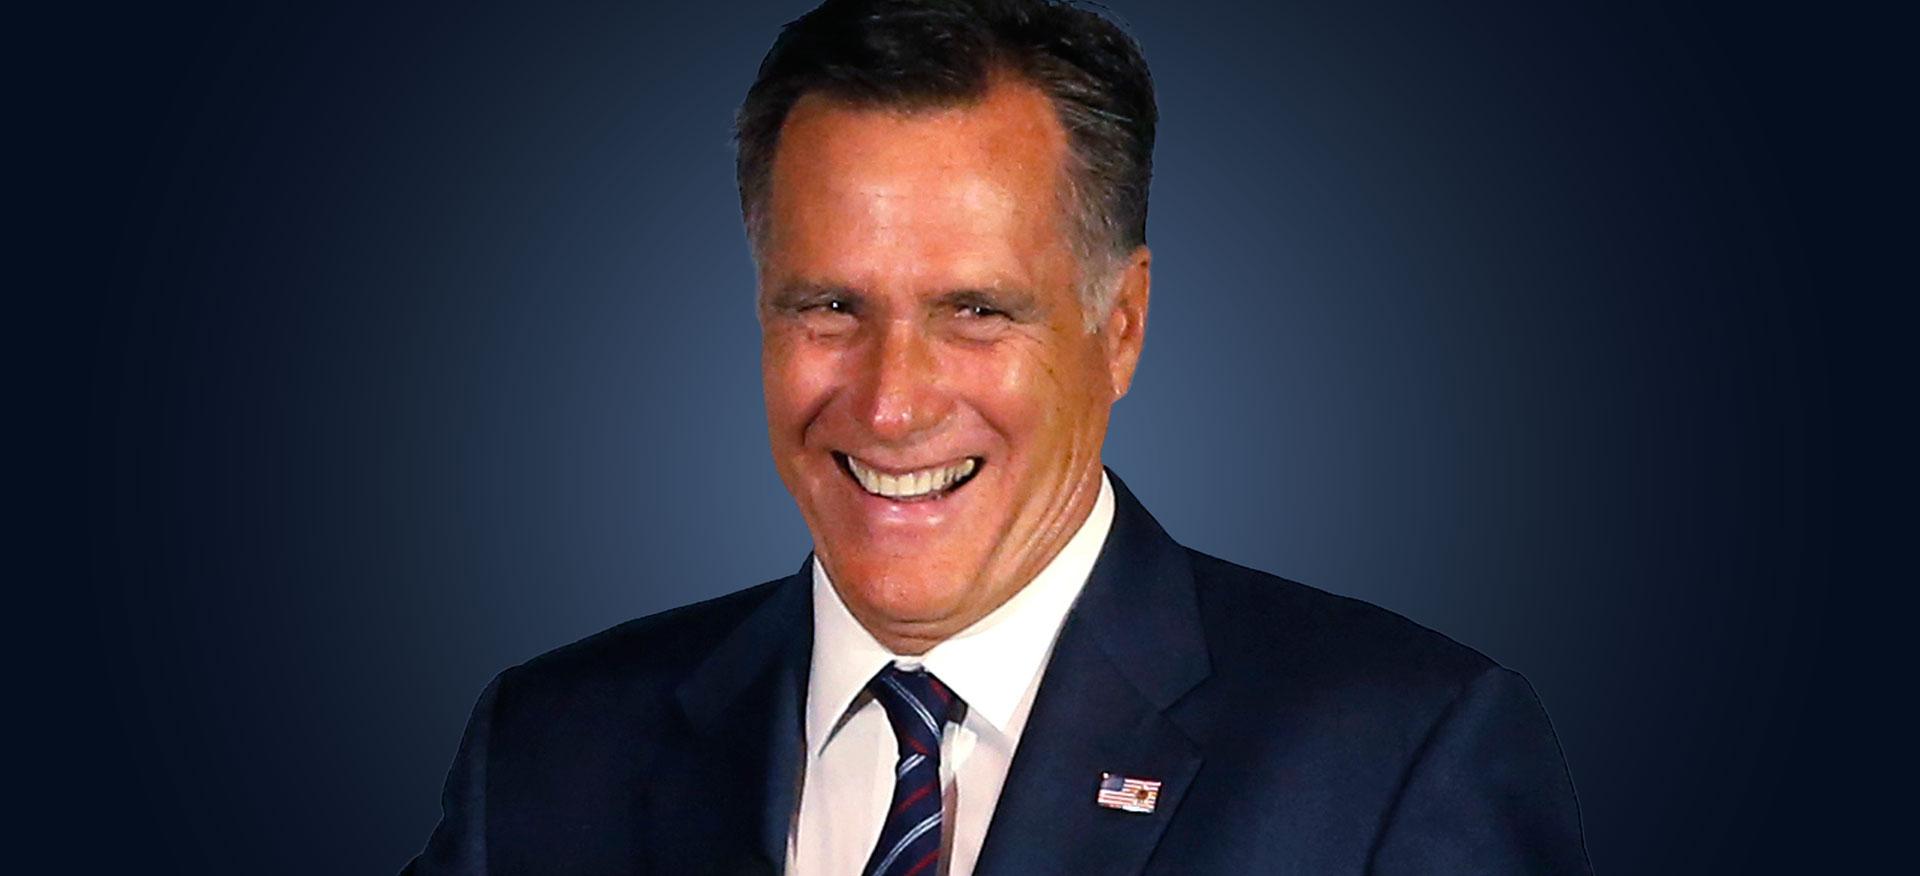 Romney Calling Trump 'Phony,' Urging Republicans To Shun Him